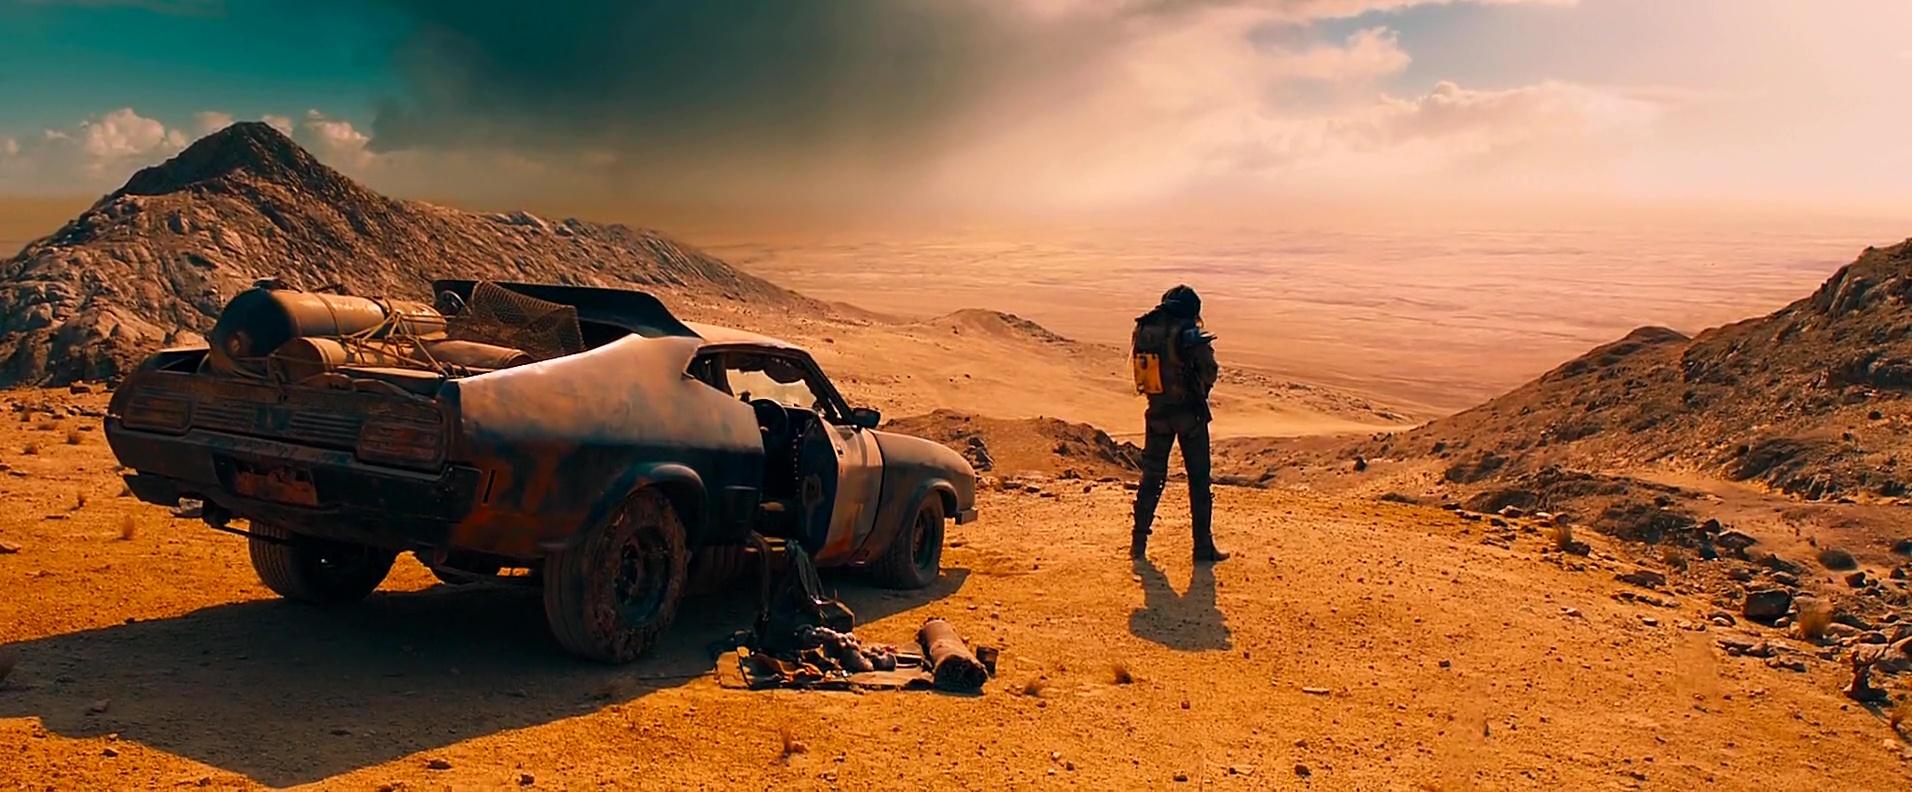 Galerie Mad Max : Fury Road 1